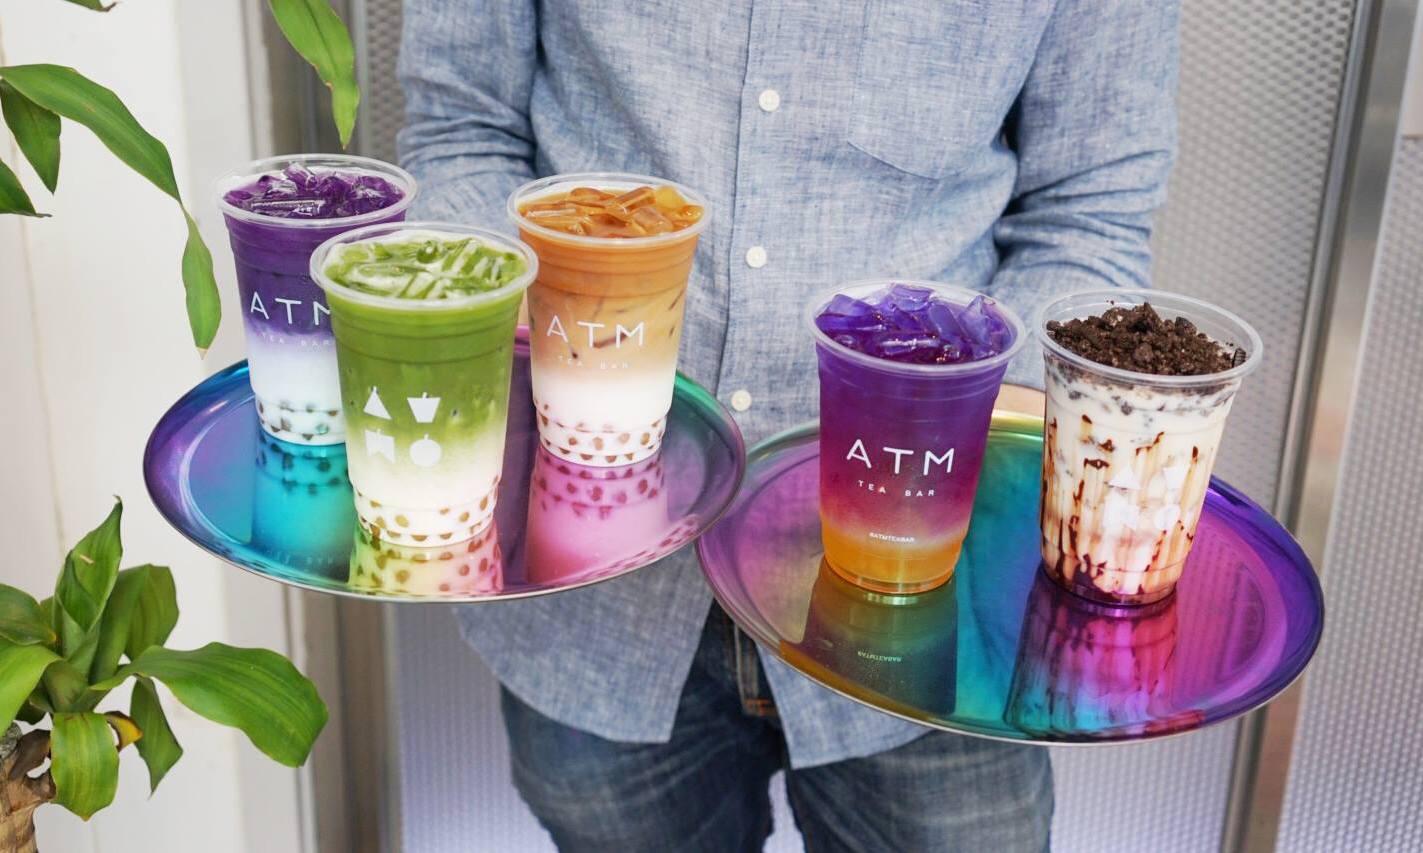 The best bubble tea bars in Bangkok, ranked